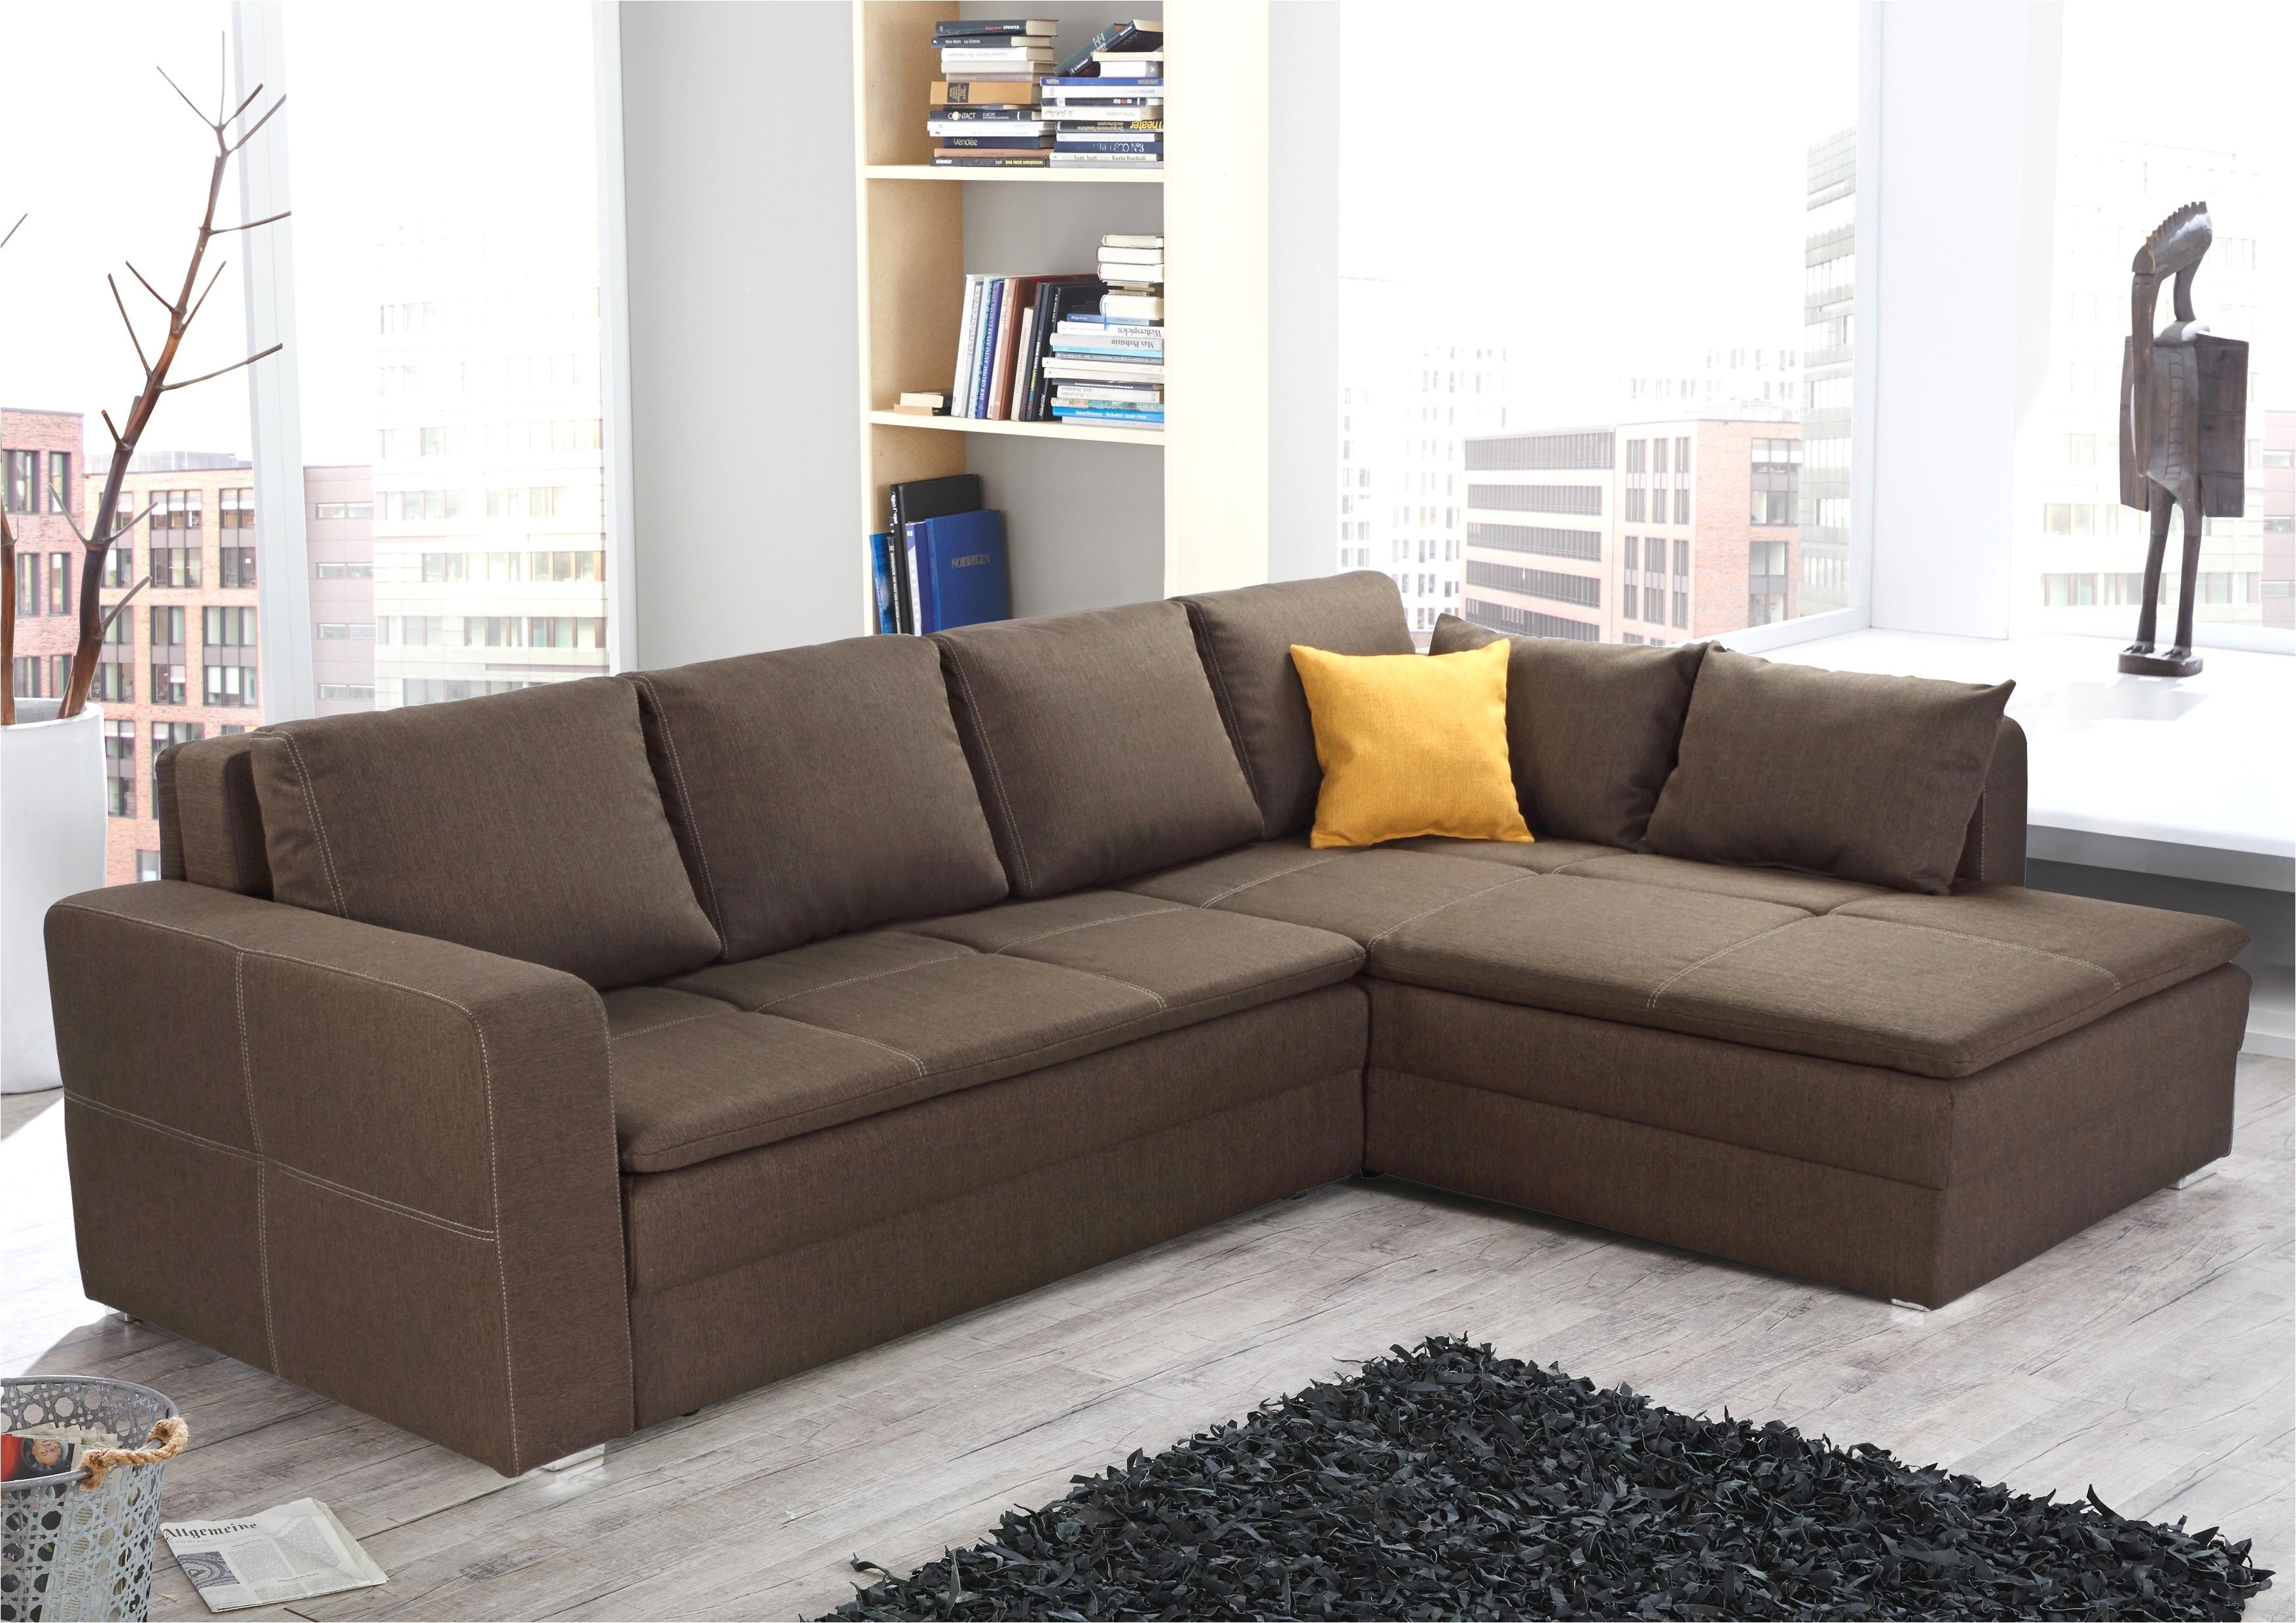 gunstige sofa macys furniture 0d archives modern house ideas and